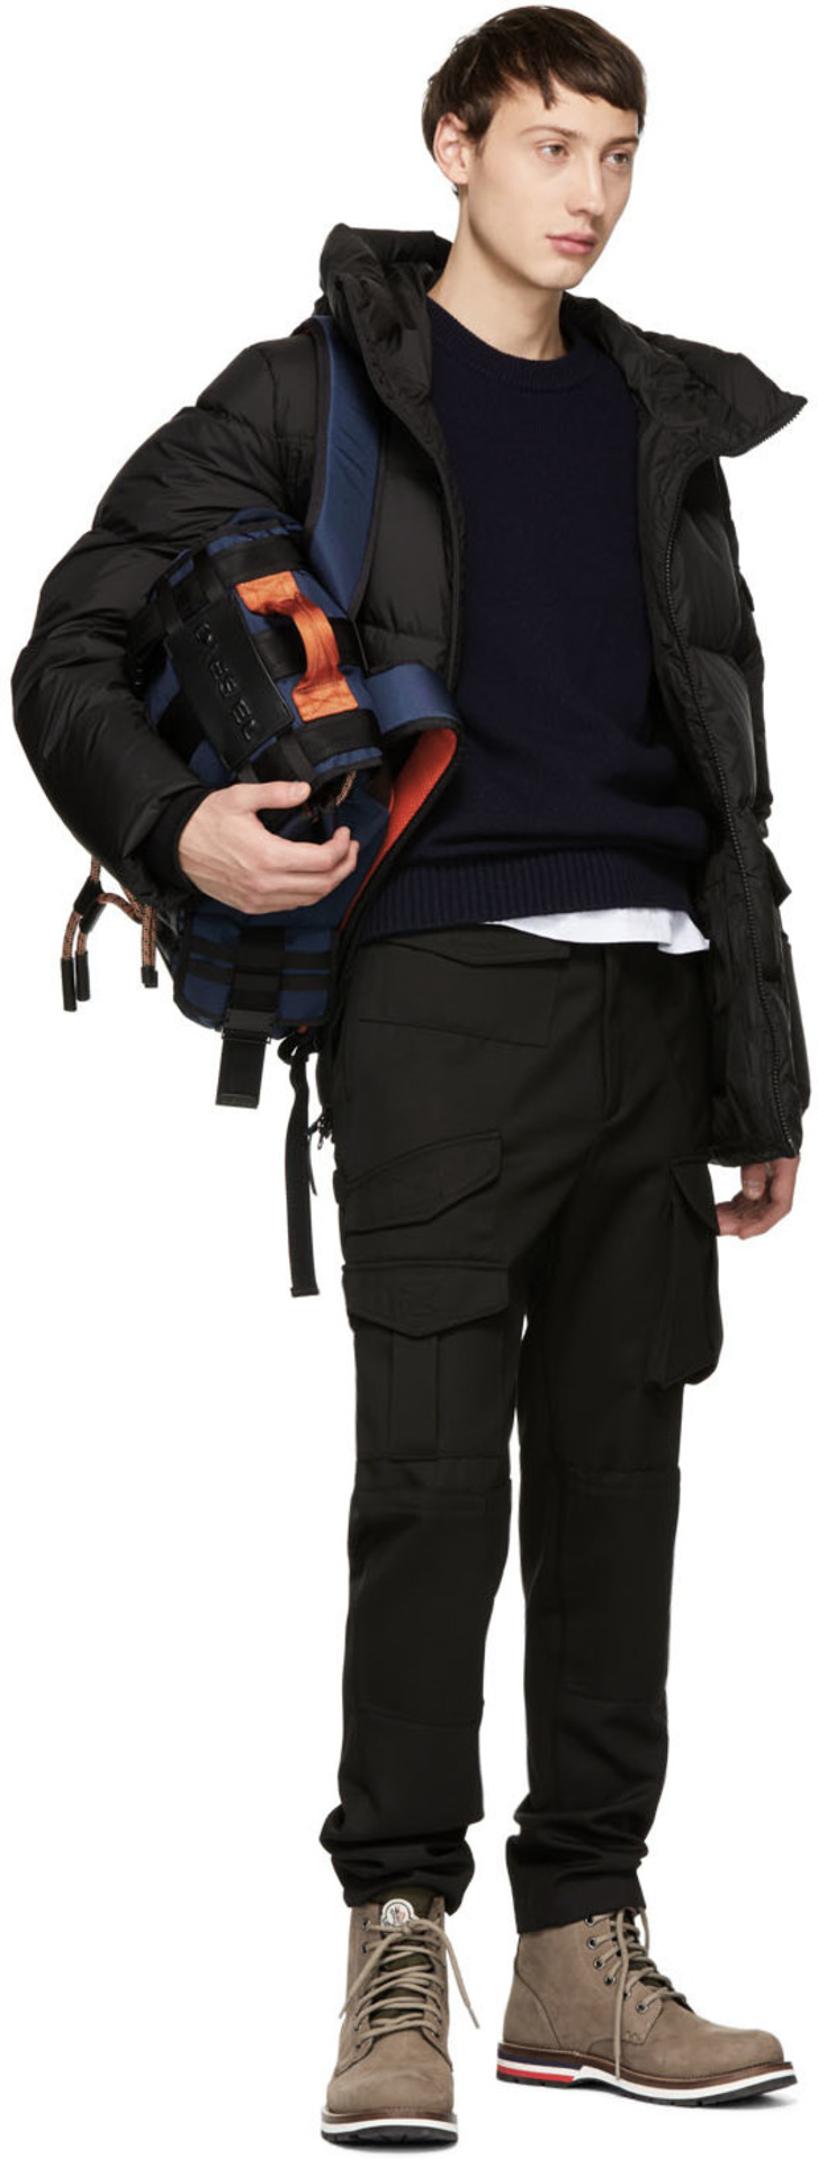 1a3f8ee81 Woolrich John Rich And Bros Black Down Sierra Supreme Short Jacket in Blk  Black